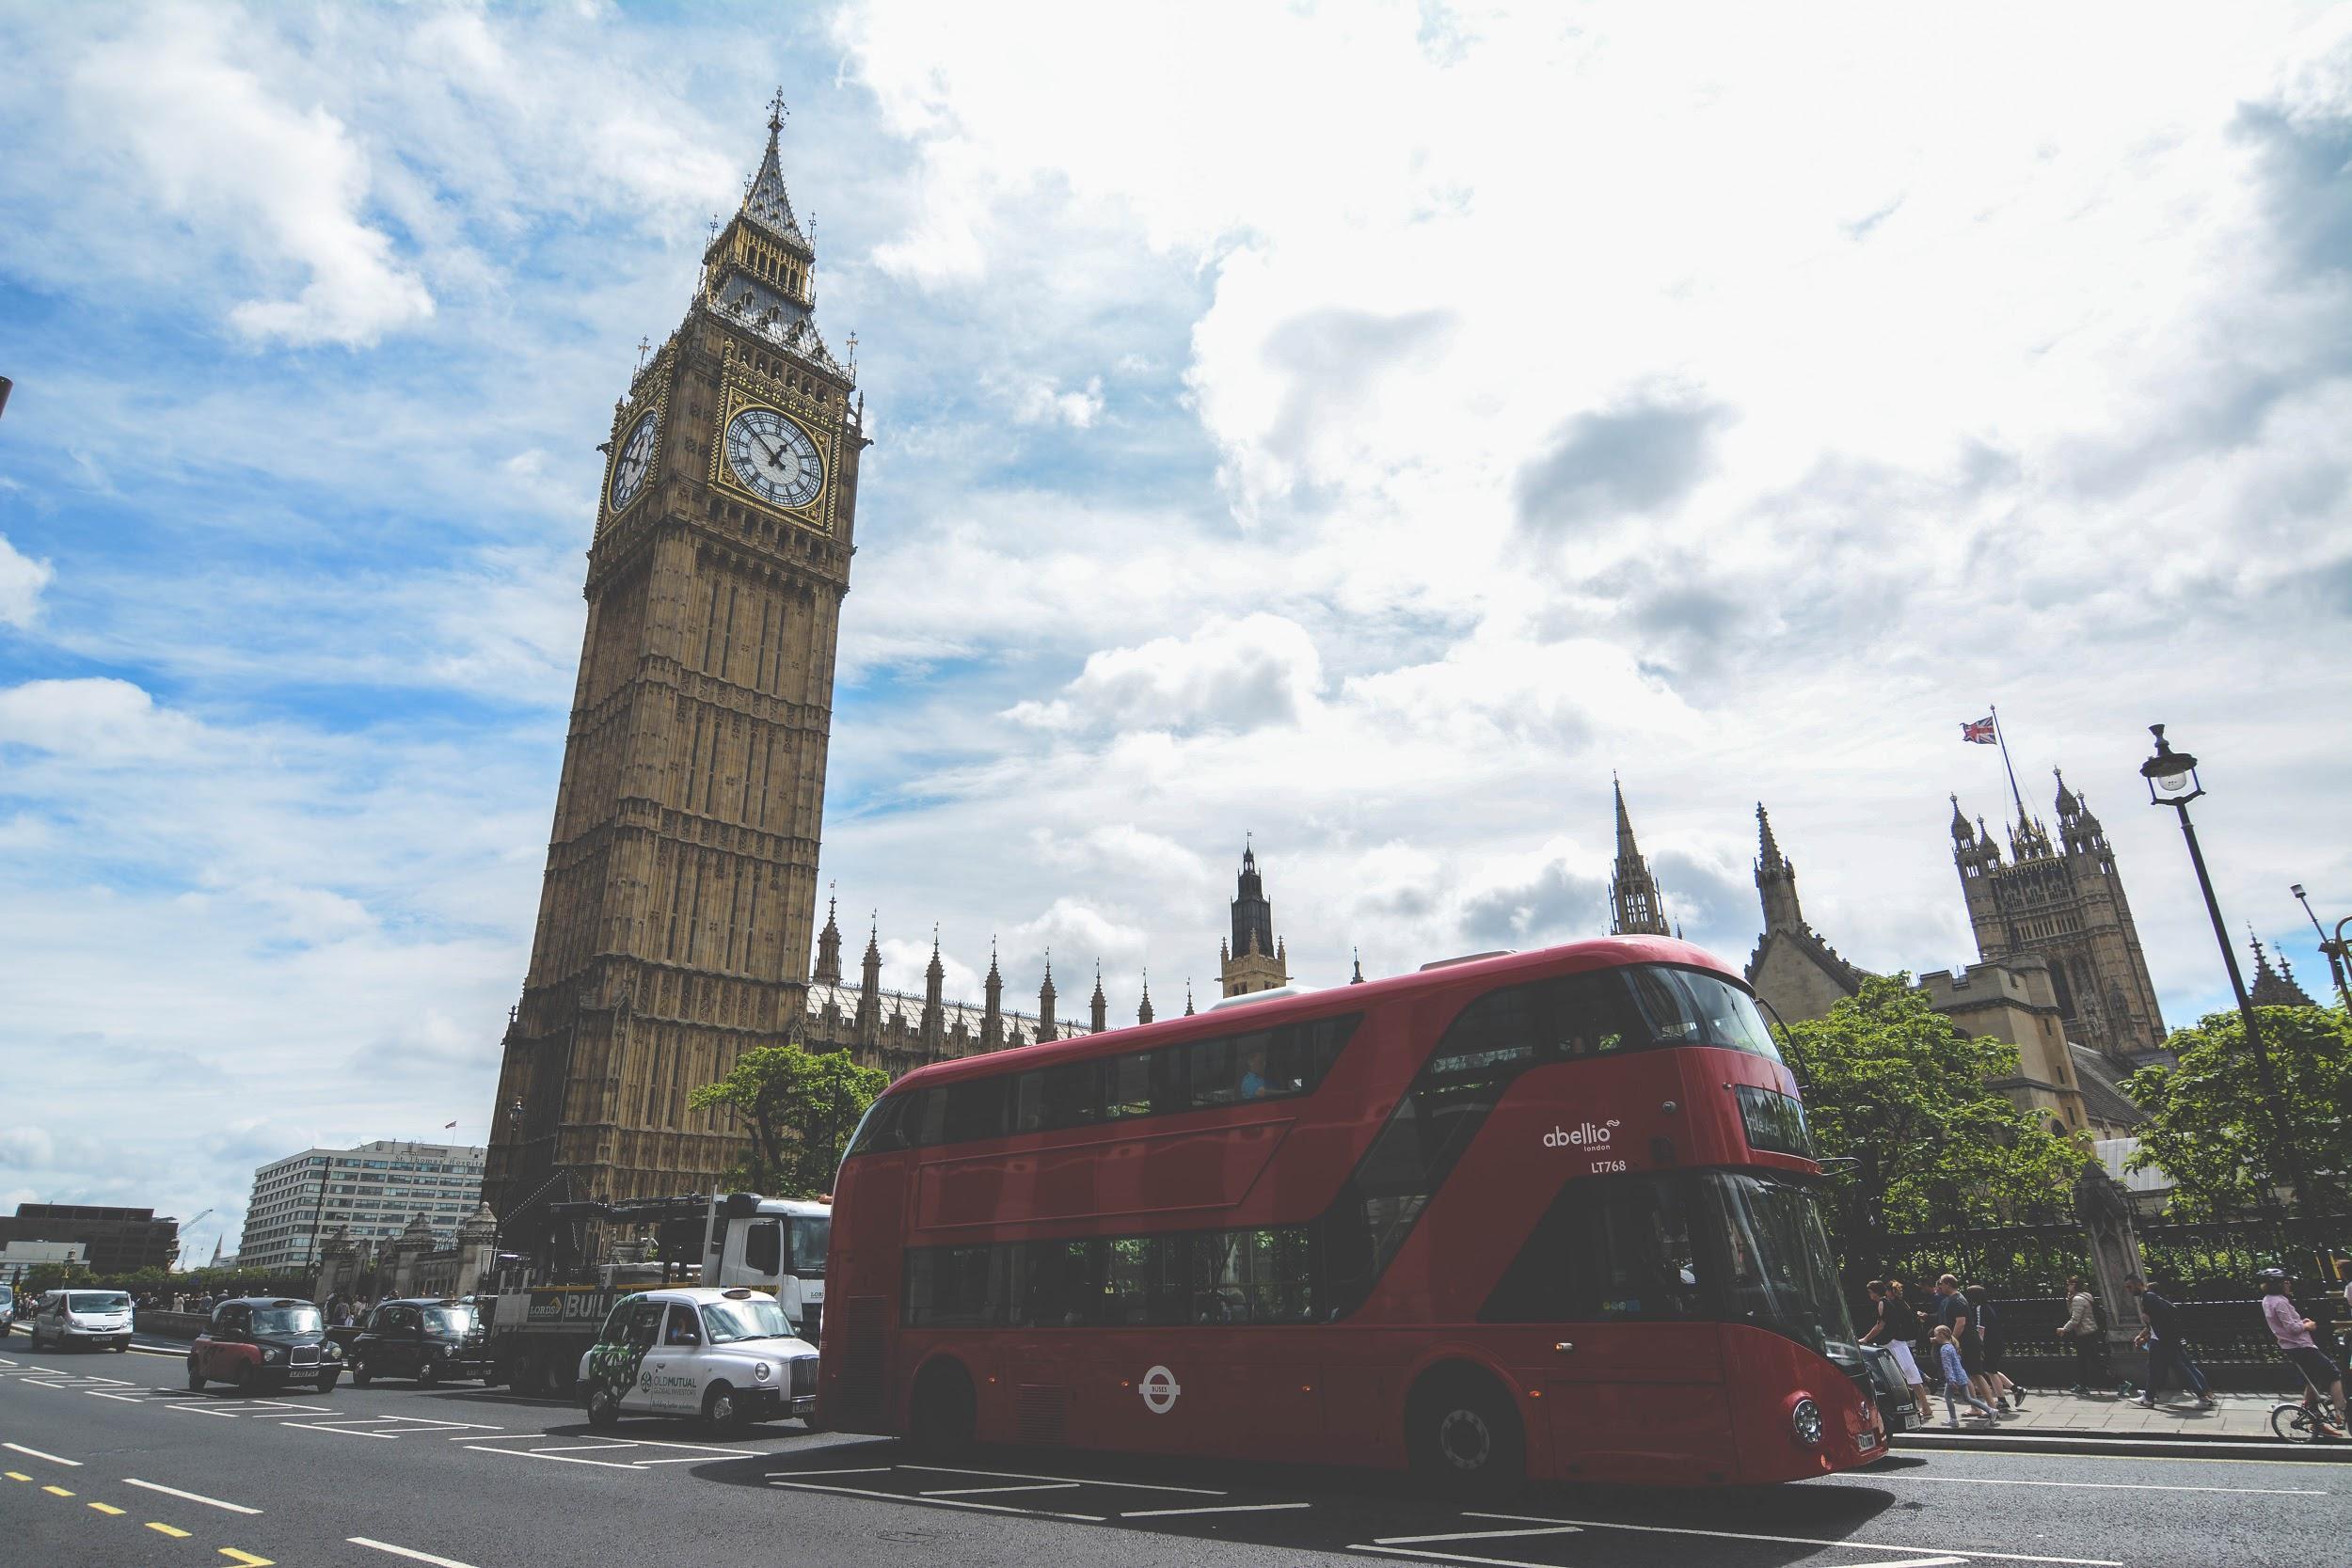 It doesn't get more London than this — Big Ben & Unitrans. (DANIEL TAK)